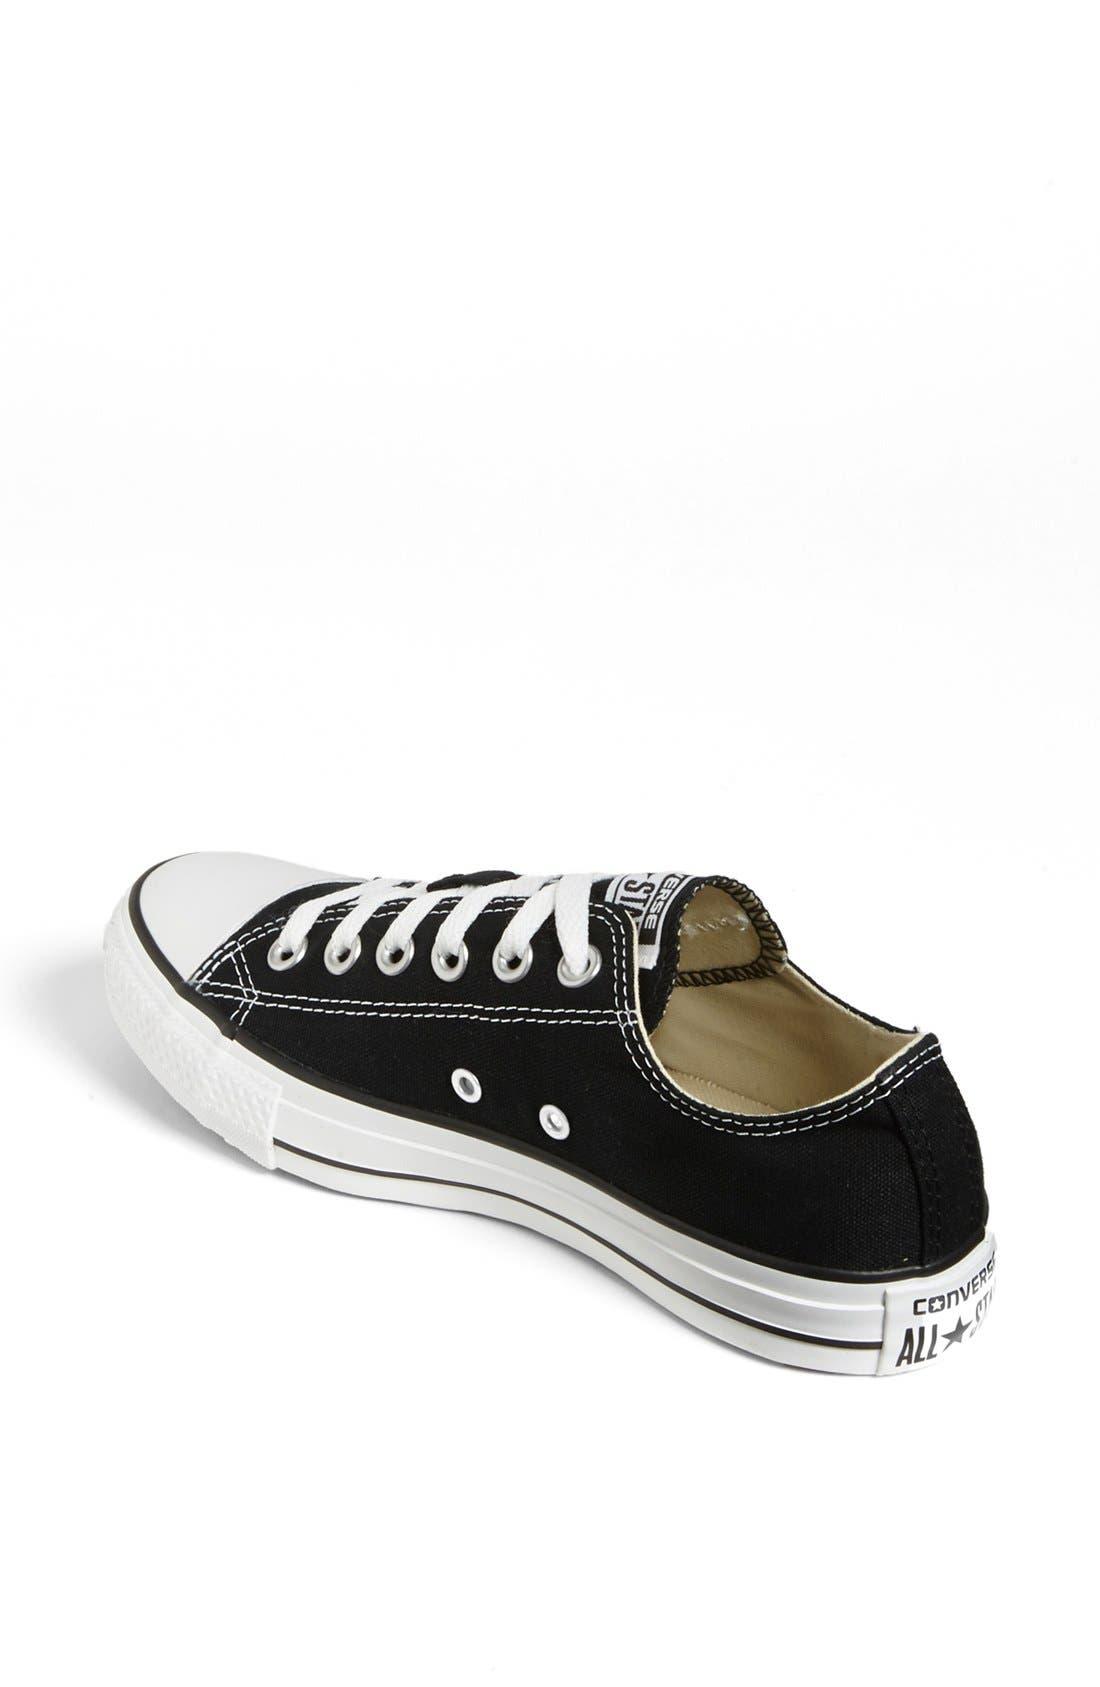 Alternate Image 2  - Converse Chuck Taylor® Low Top Sneaker (Women)